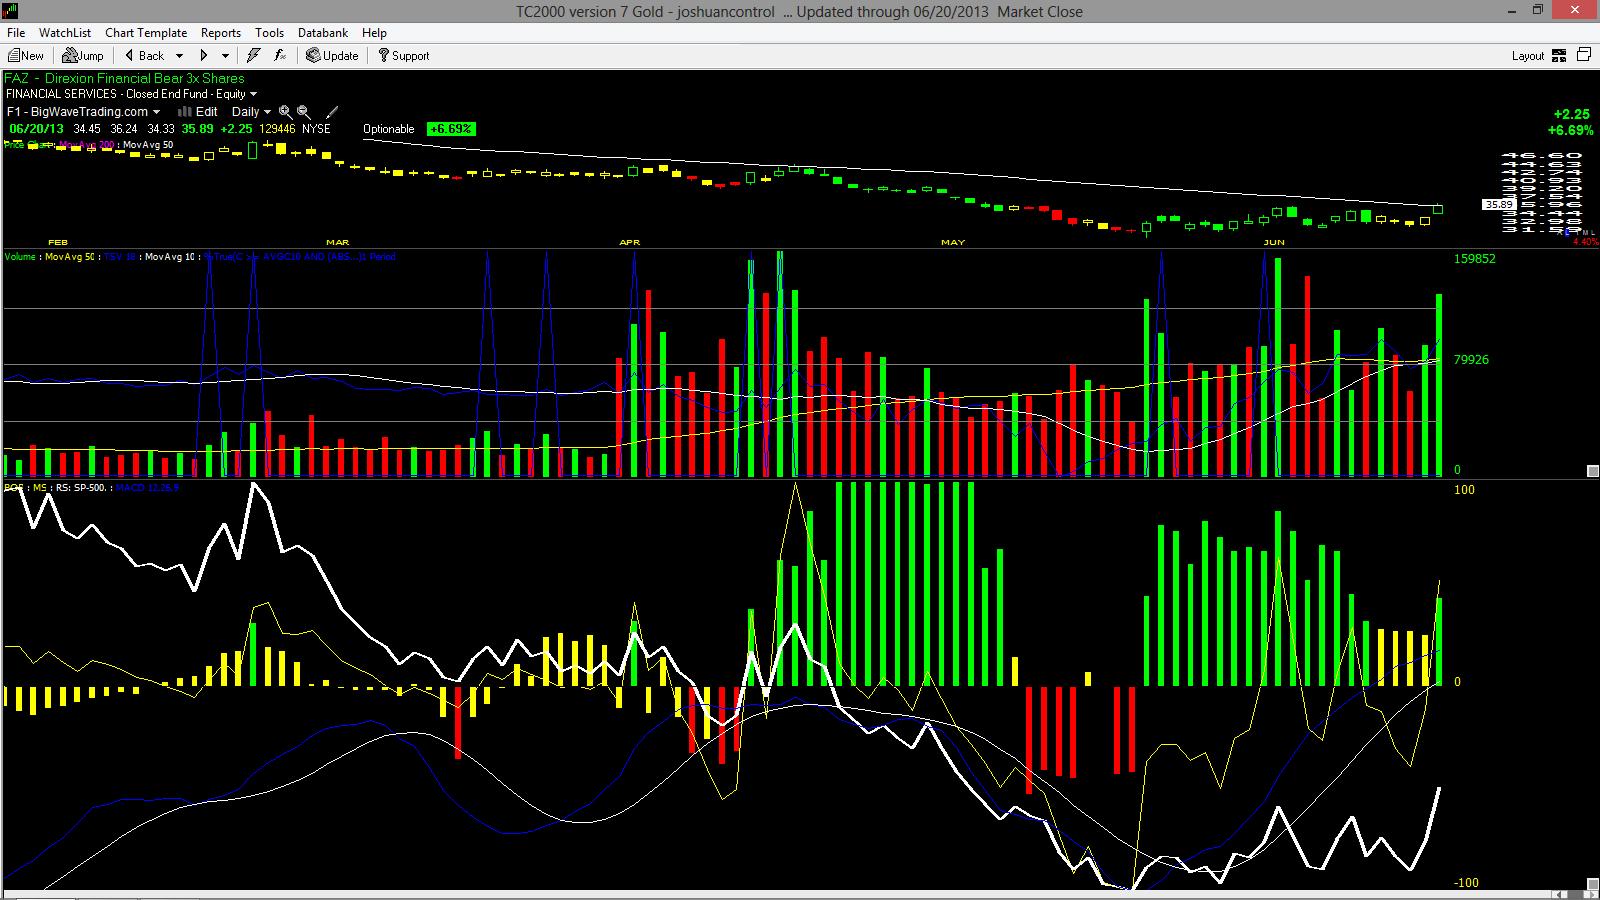 Best 49 Stock Trader Wallpaper on HipWallpaper iOS 7 Stock 1600x900